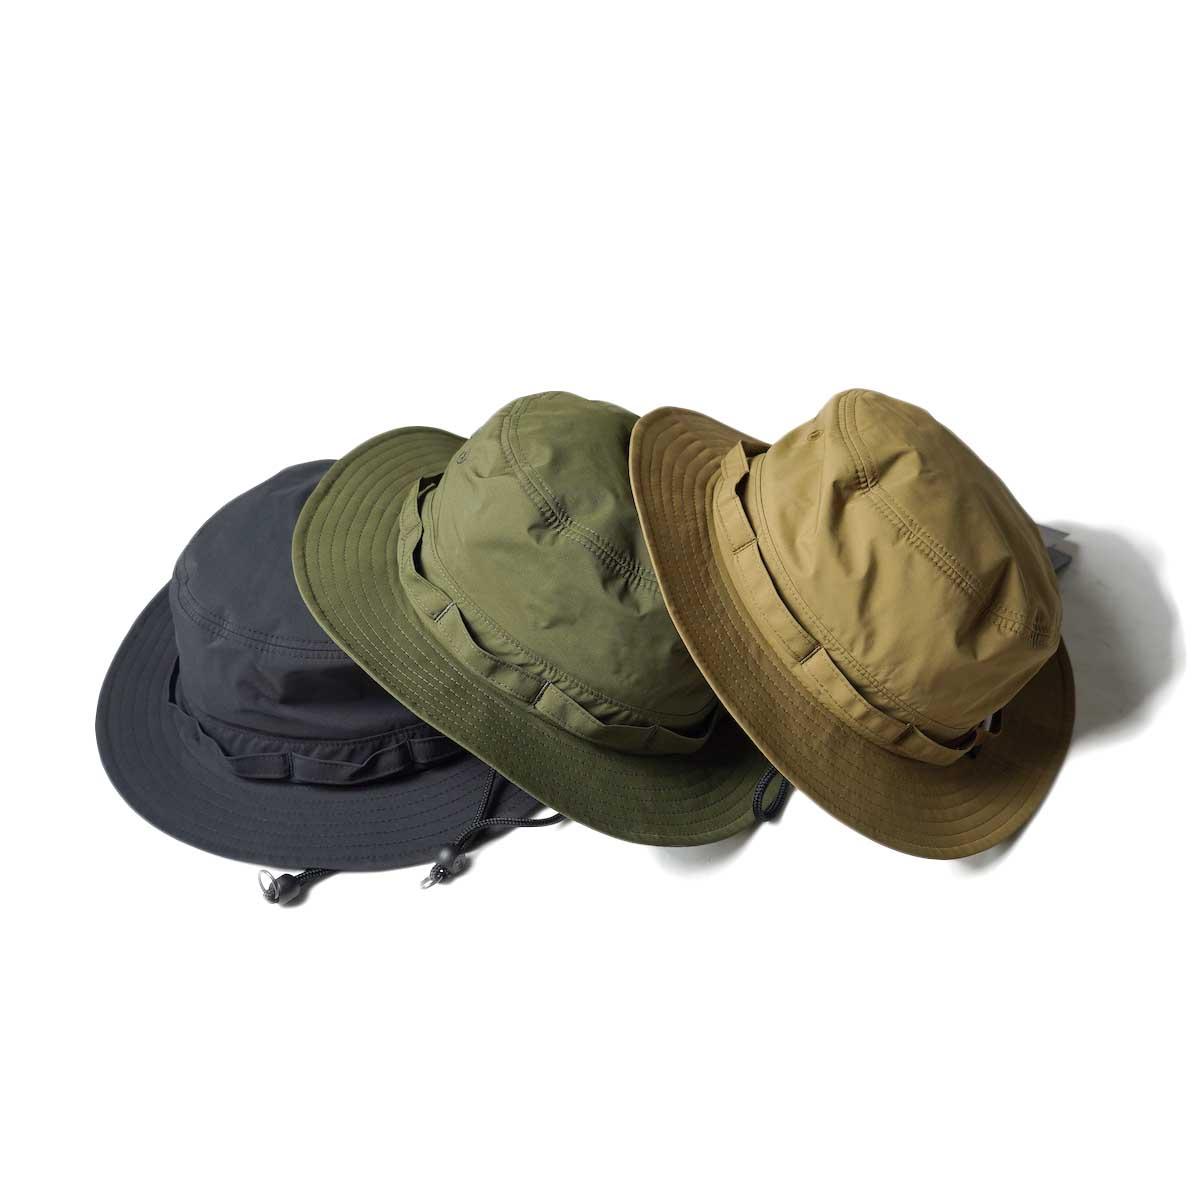 DAIWA PIER39 / GORE-TEX INFINIUM™ Tech Jungle Hat (RIP-STOP)